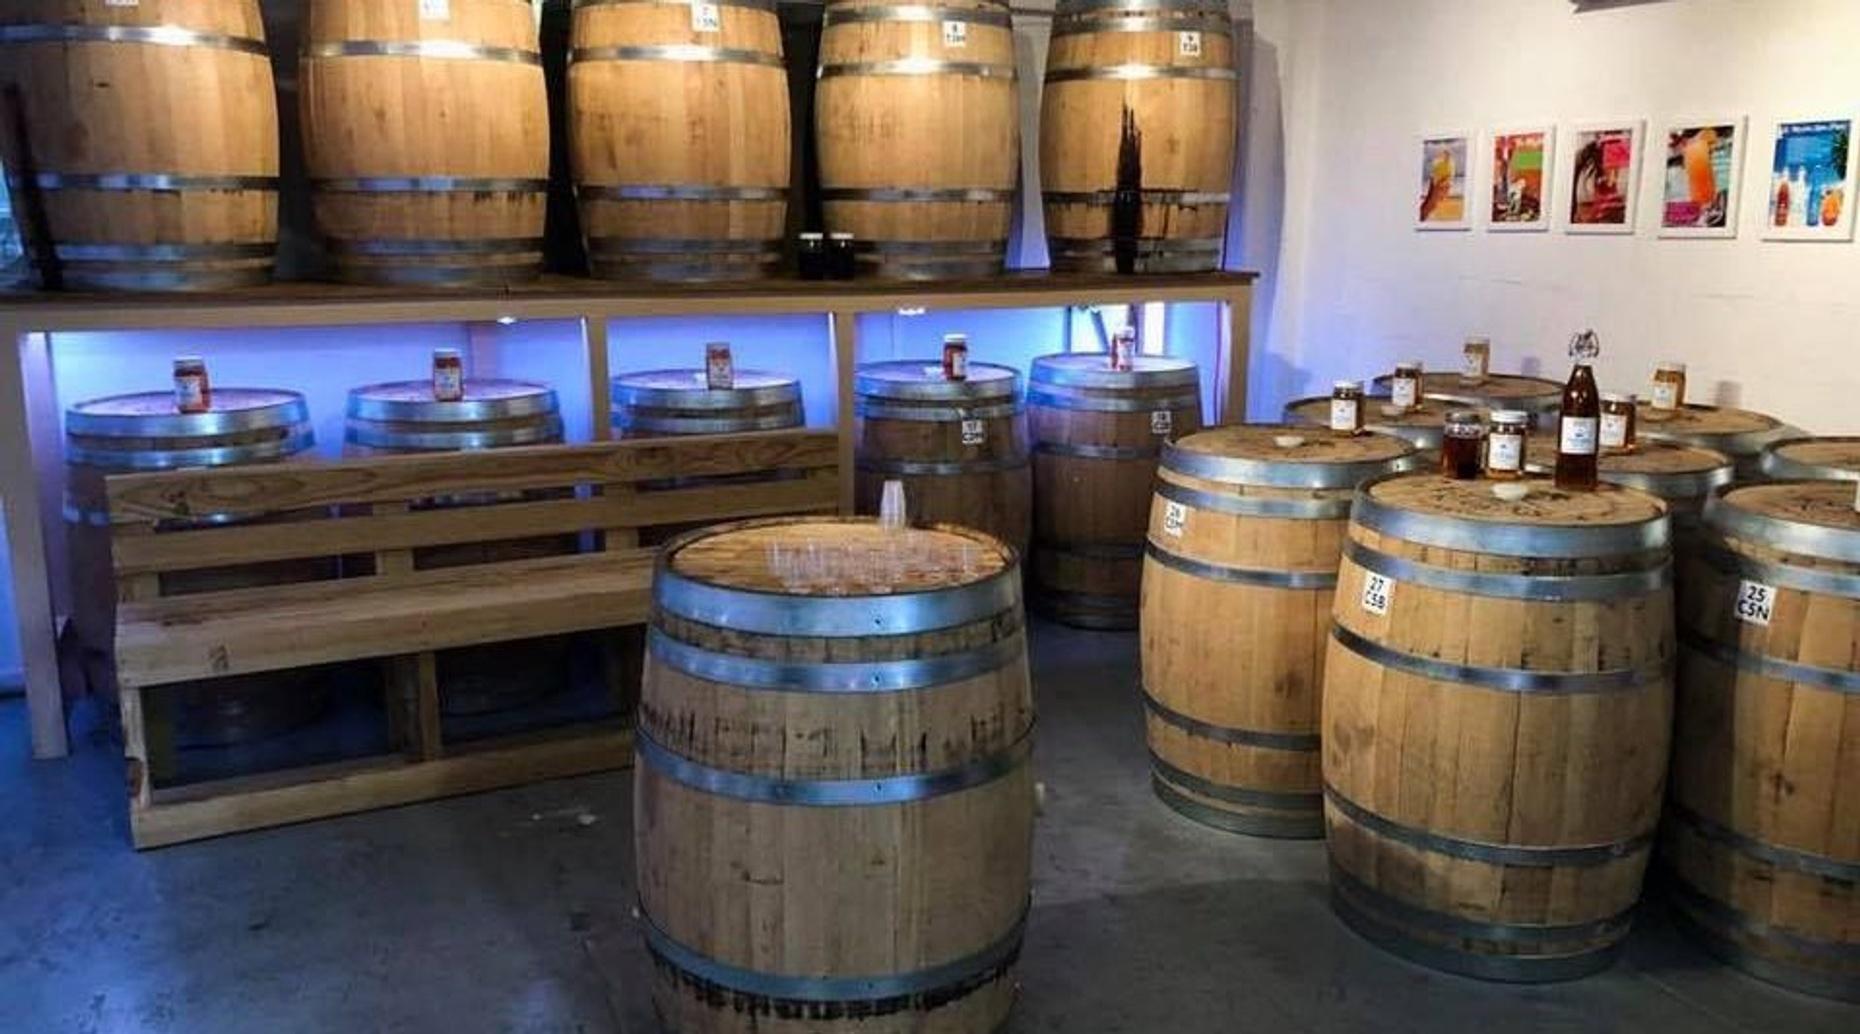 Topper's Rhum Distillery Tour in St. Maarten